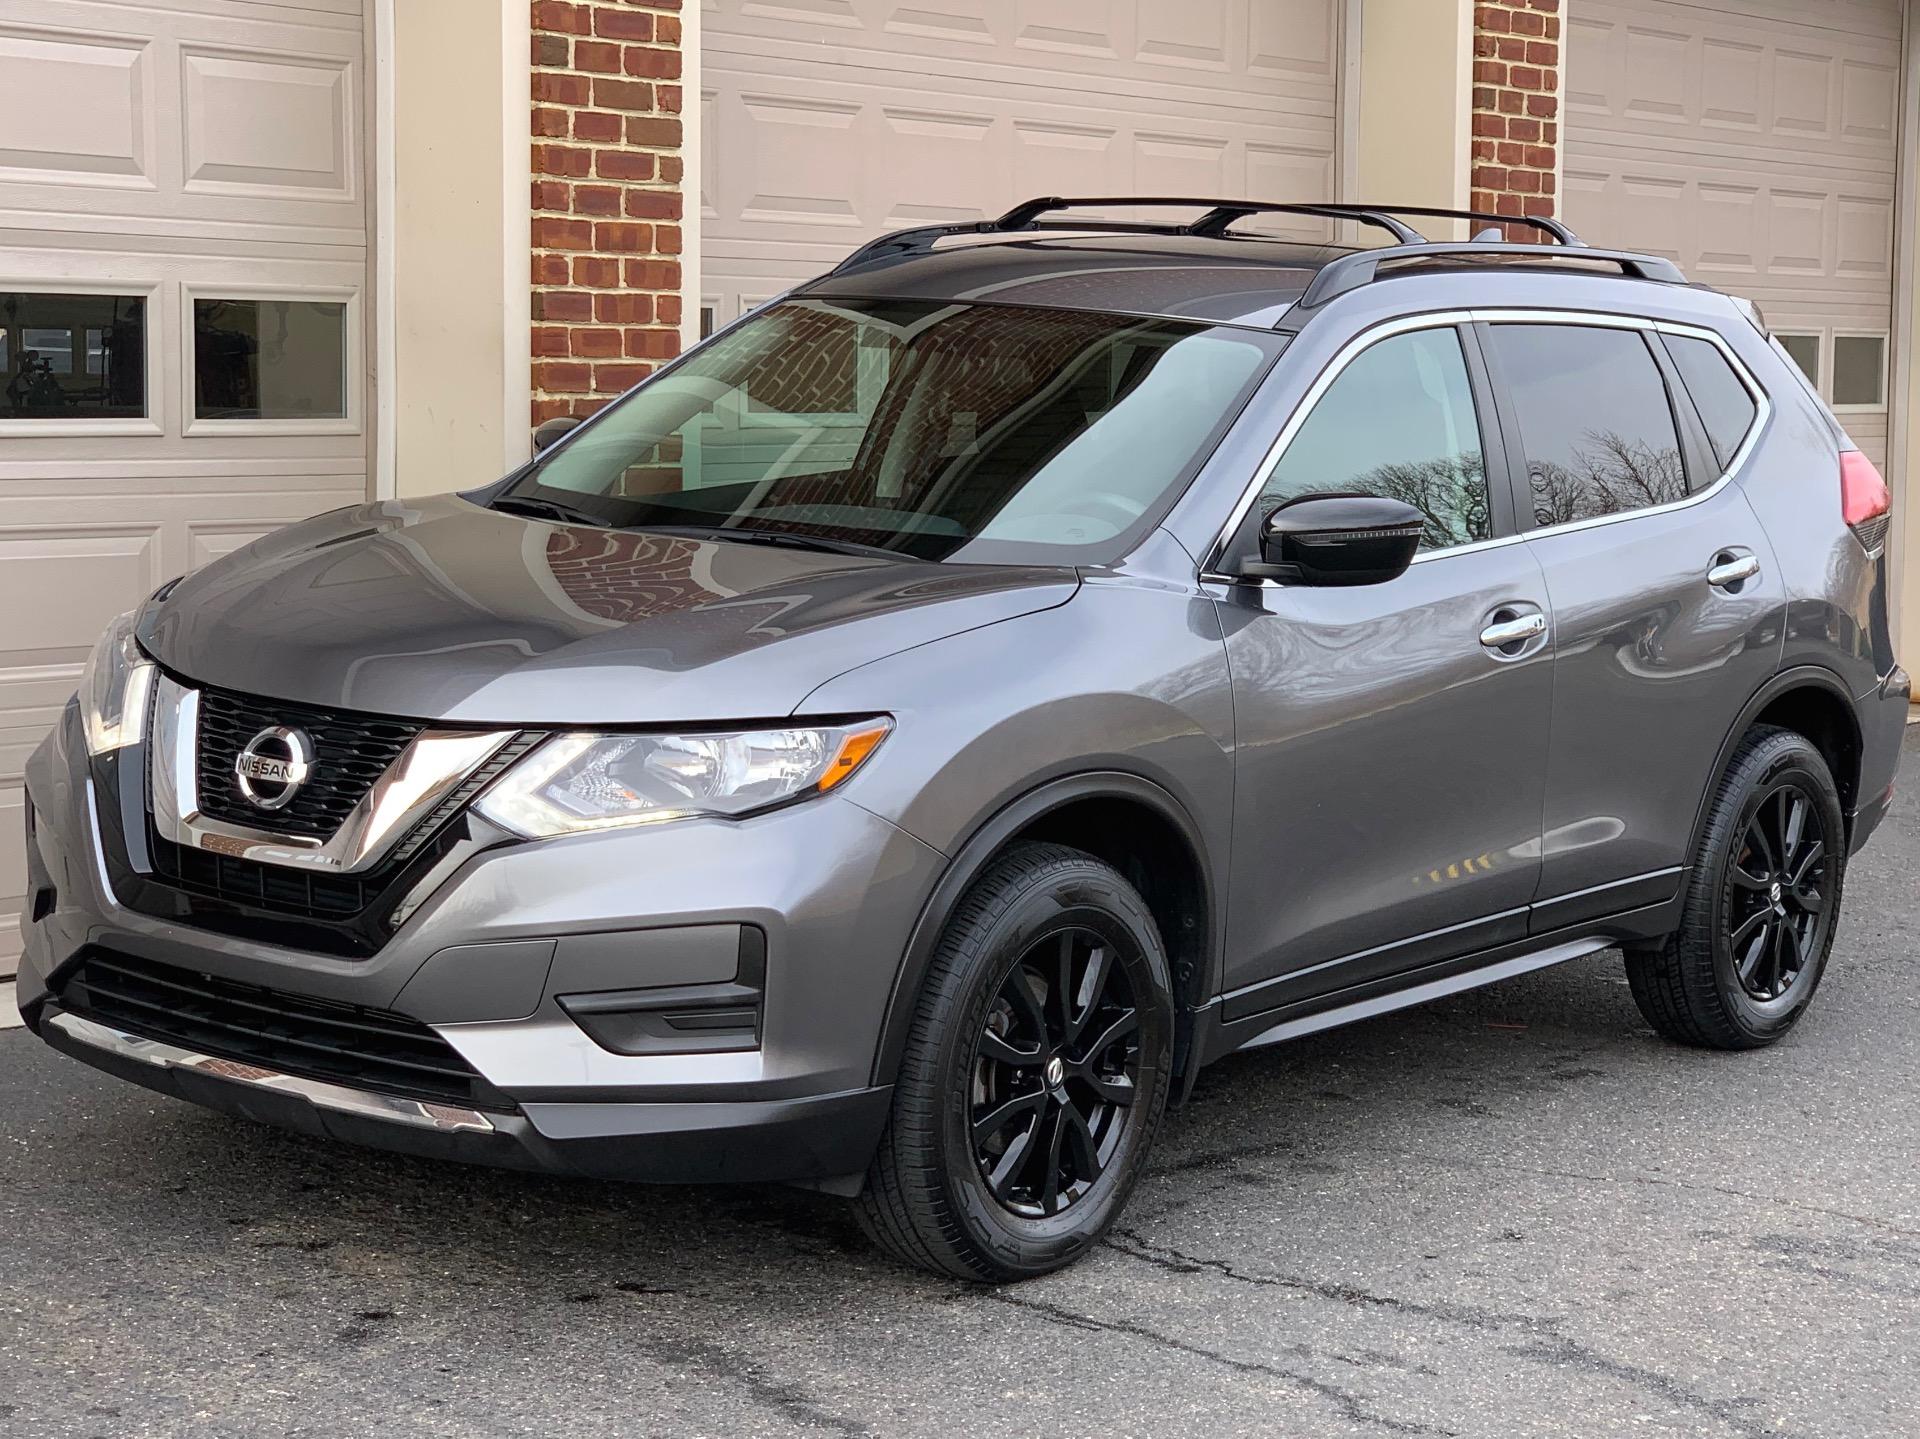 Used-2017-Nissan-Rogue-SV-Midnight-Edition